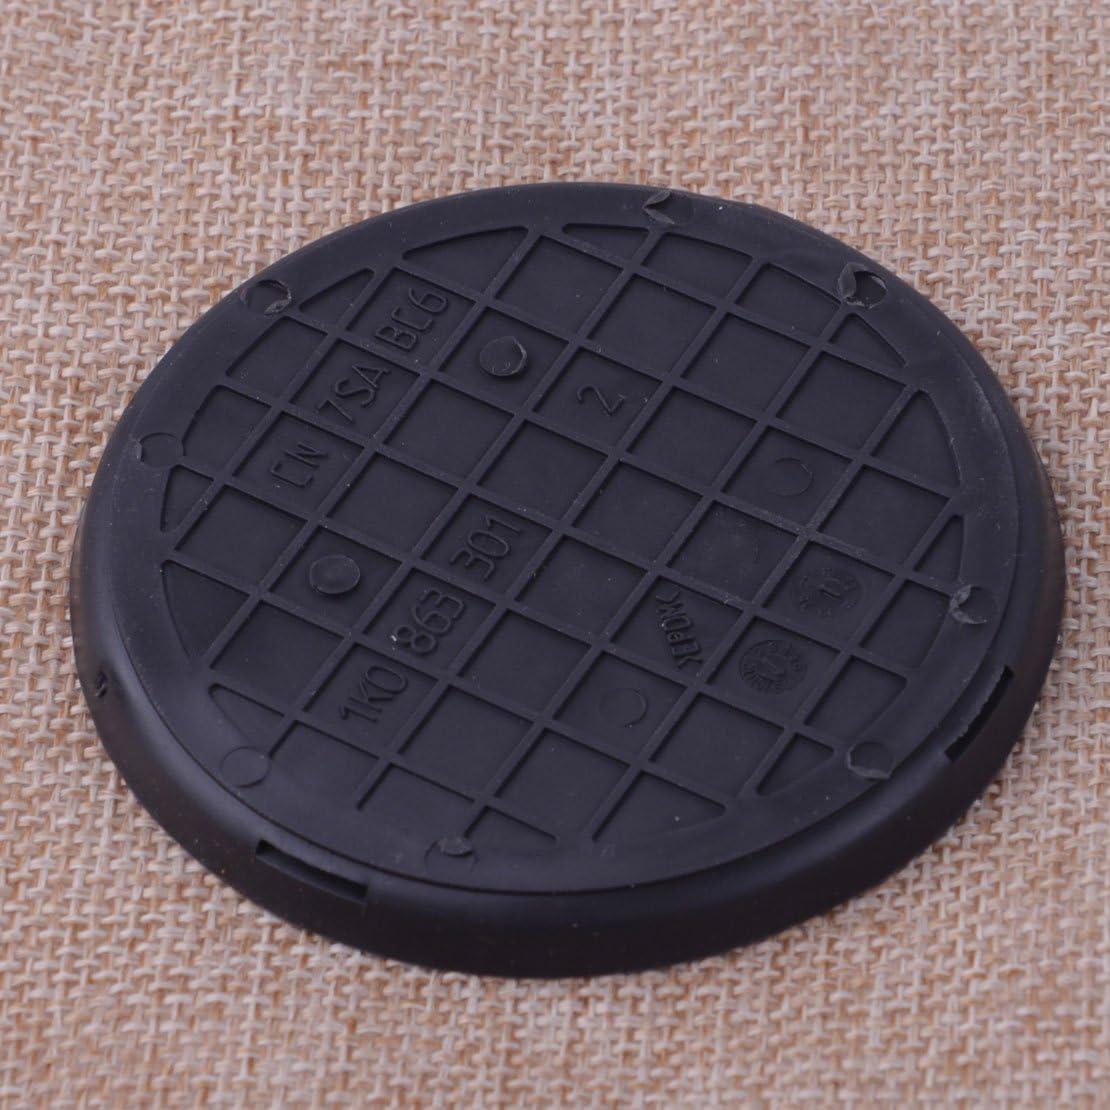 CITALL Black Rubber Water Cup Insert Holder Mat Pad